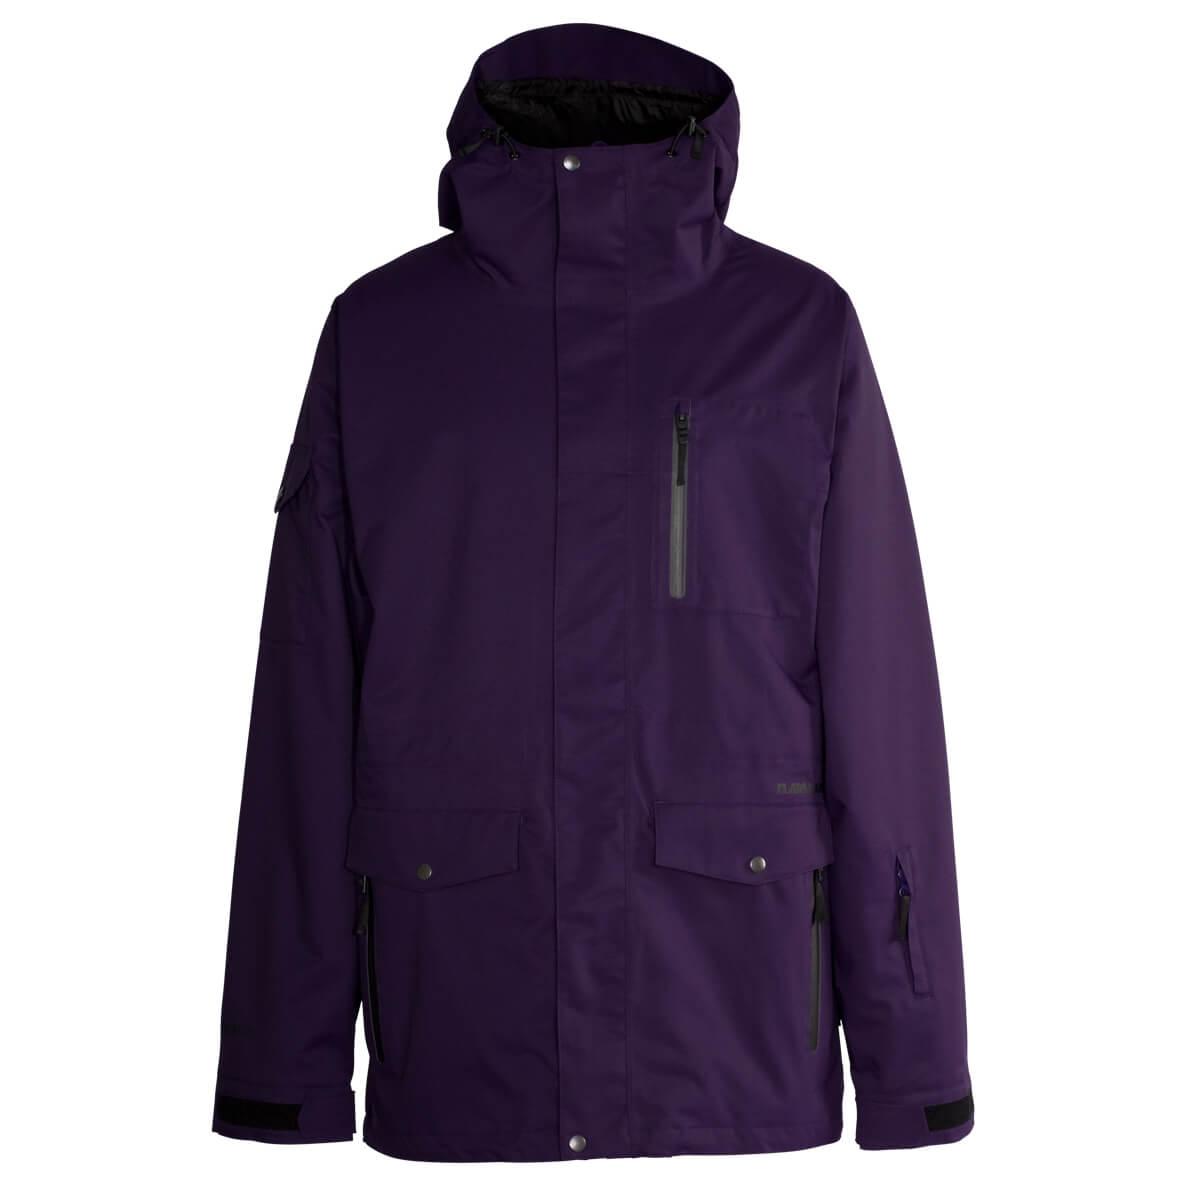 armada spearhead jacket veste de ski homme livraison. Black Bedroom Furniture Sets. Home Design Ideas